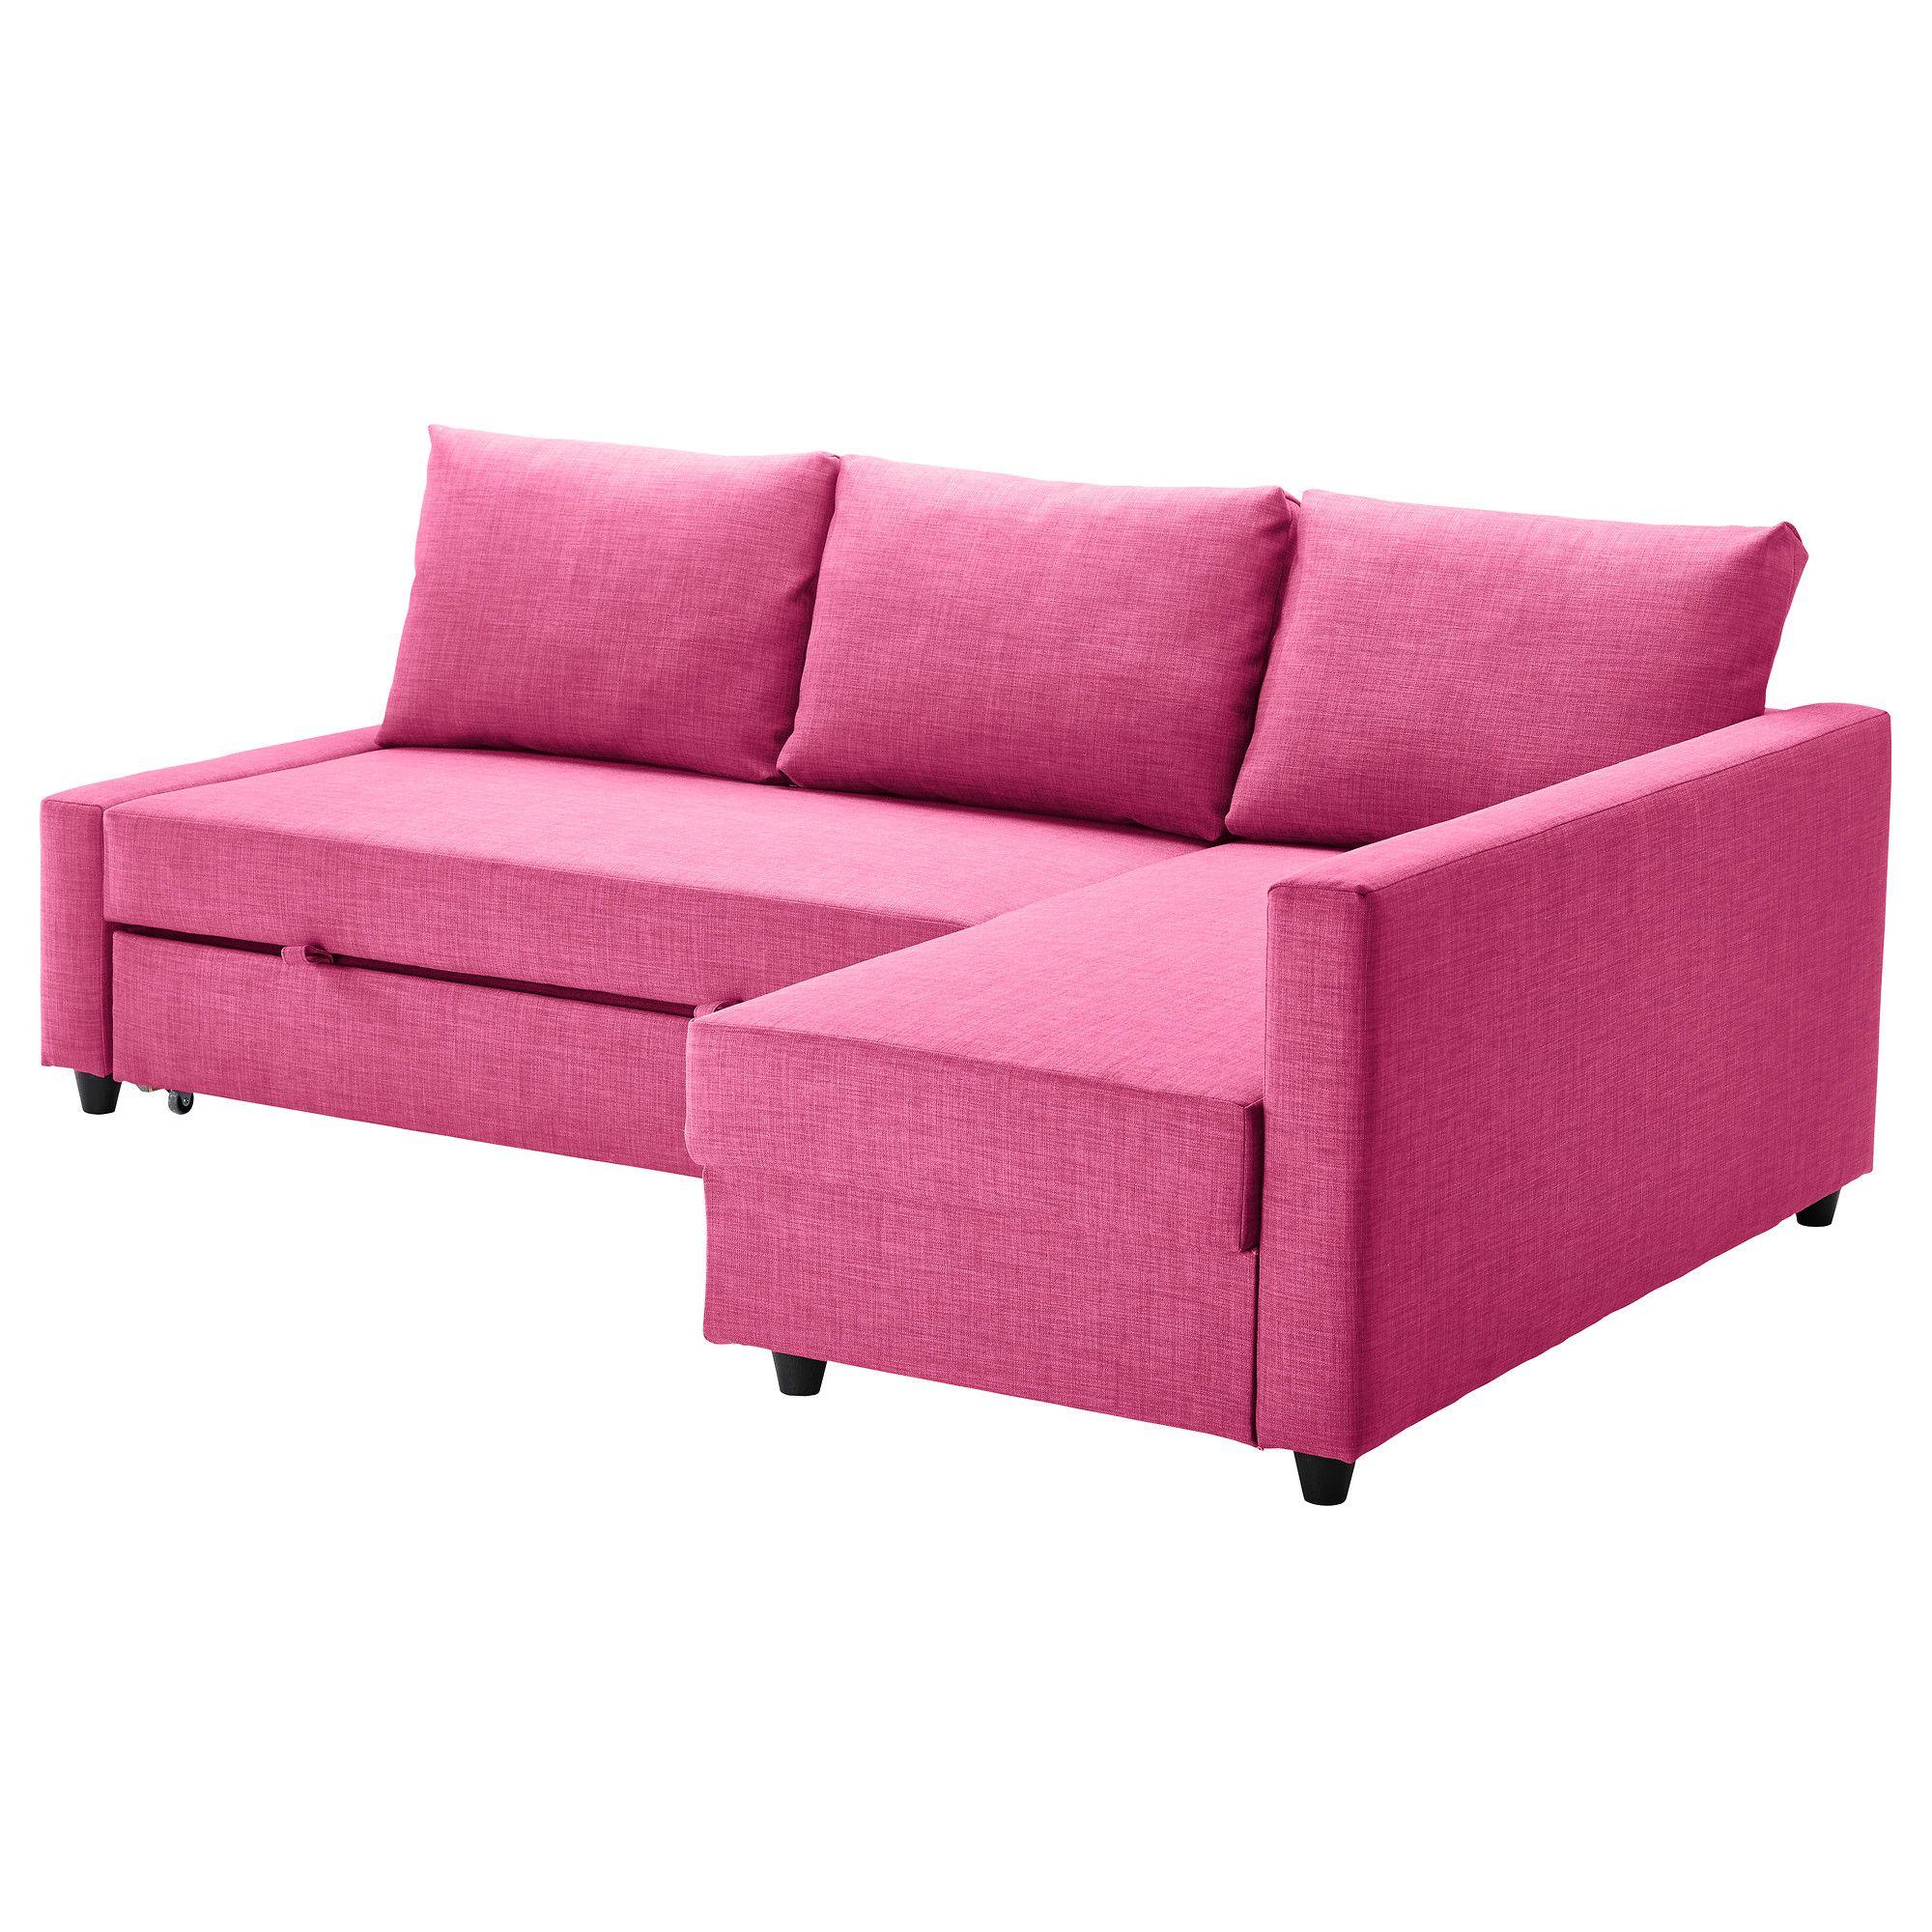 NEEEEED this for my studio seating area. $699.00 FRIHETEN Corner ...